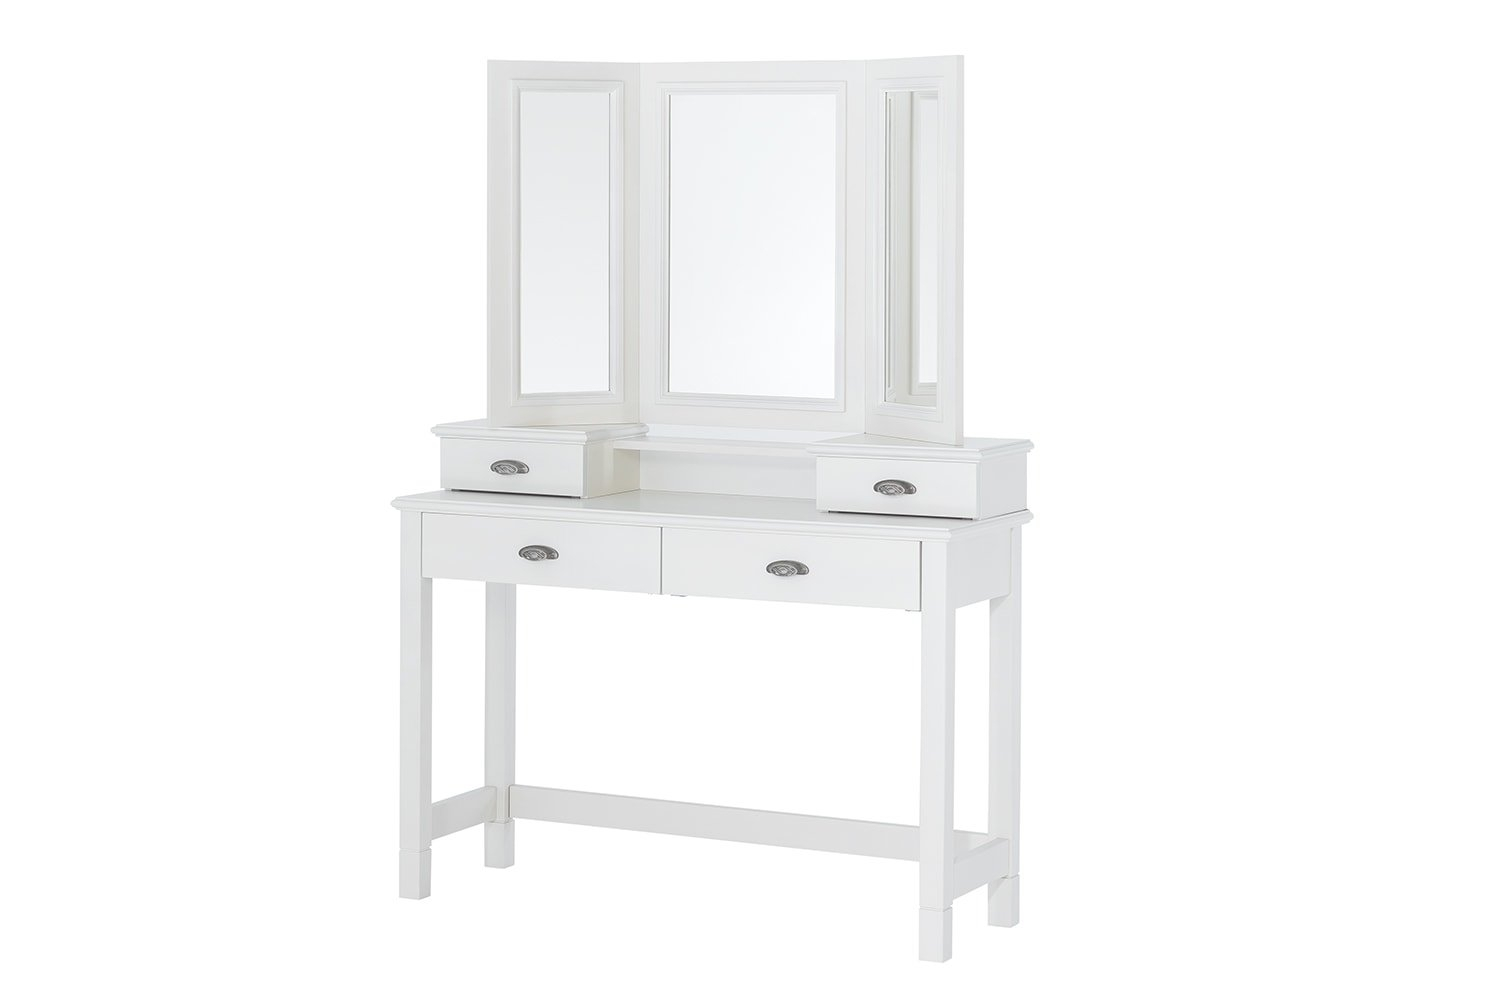 Masa de toaleta cu oglinda si sertare, din furnir si pal Madison Alb, L114xl42xH91 cm poza